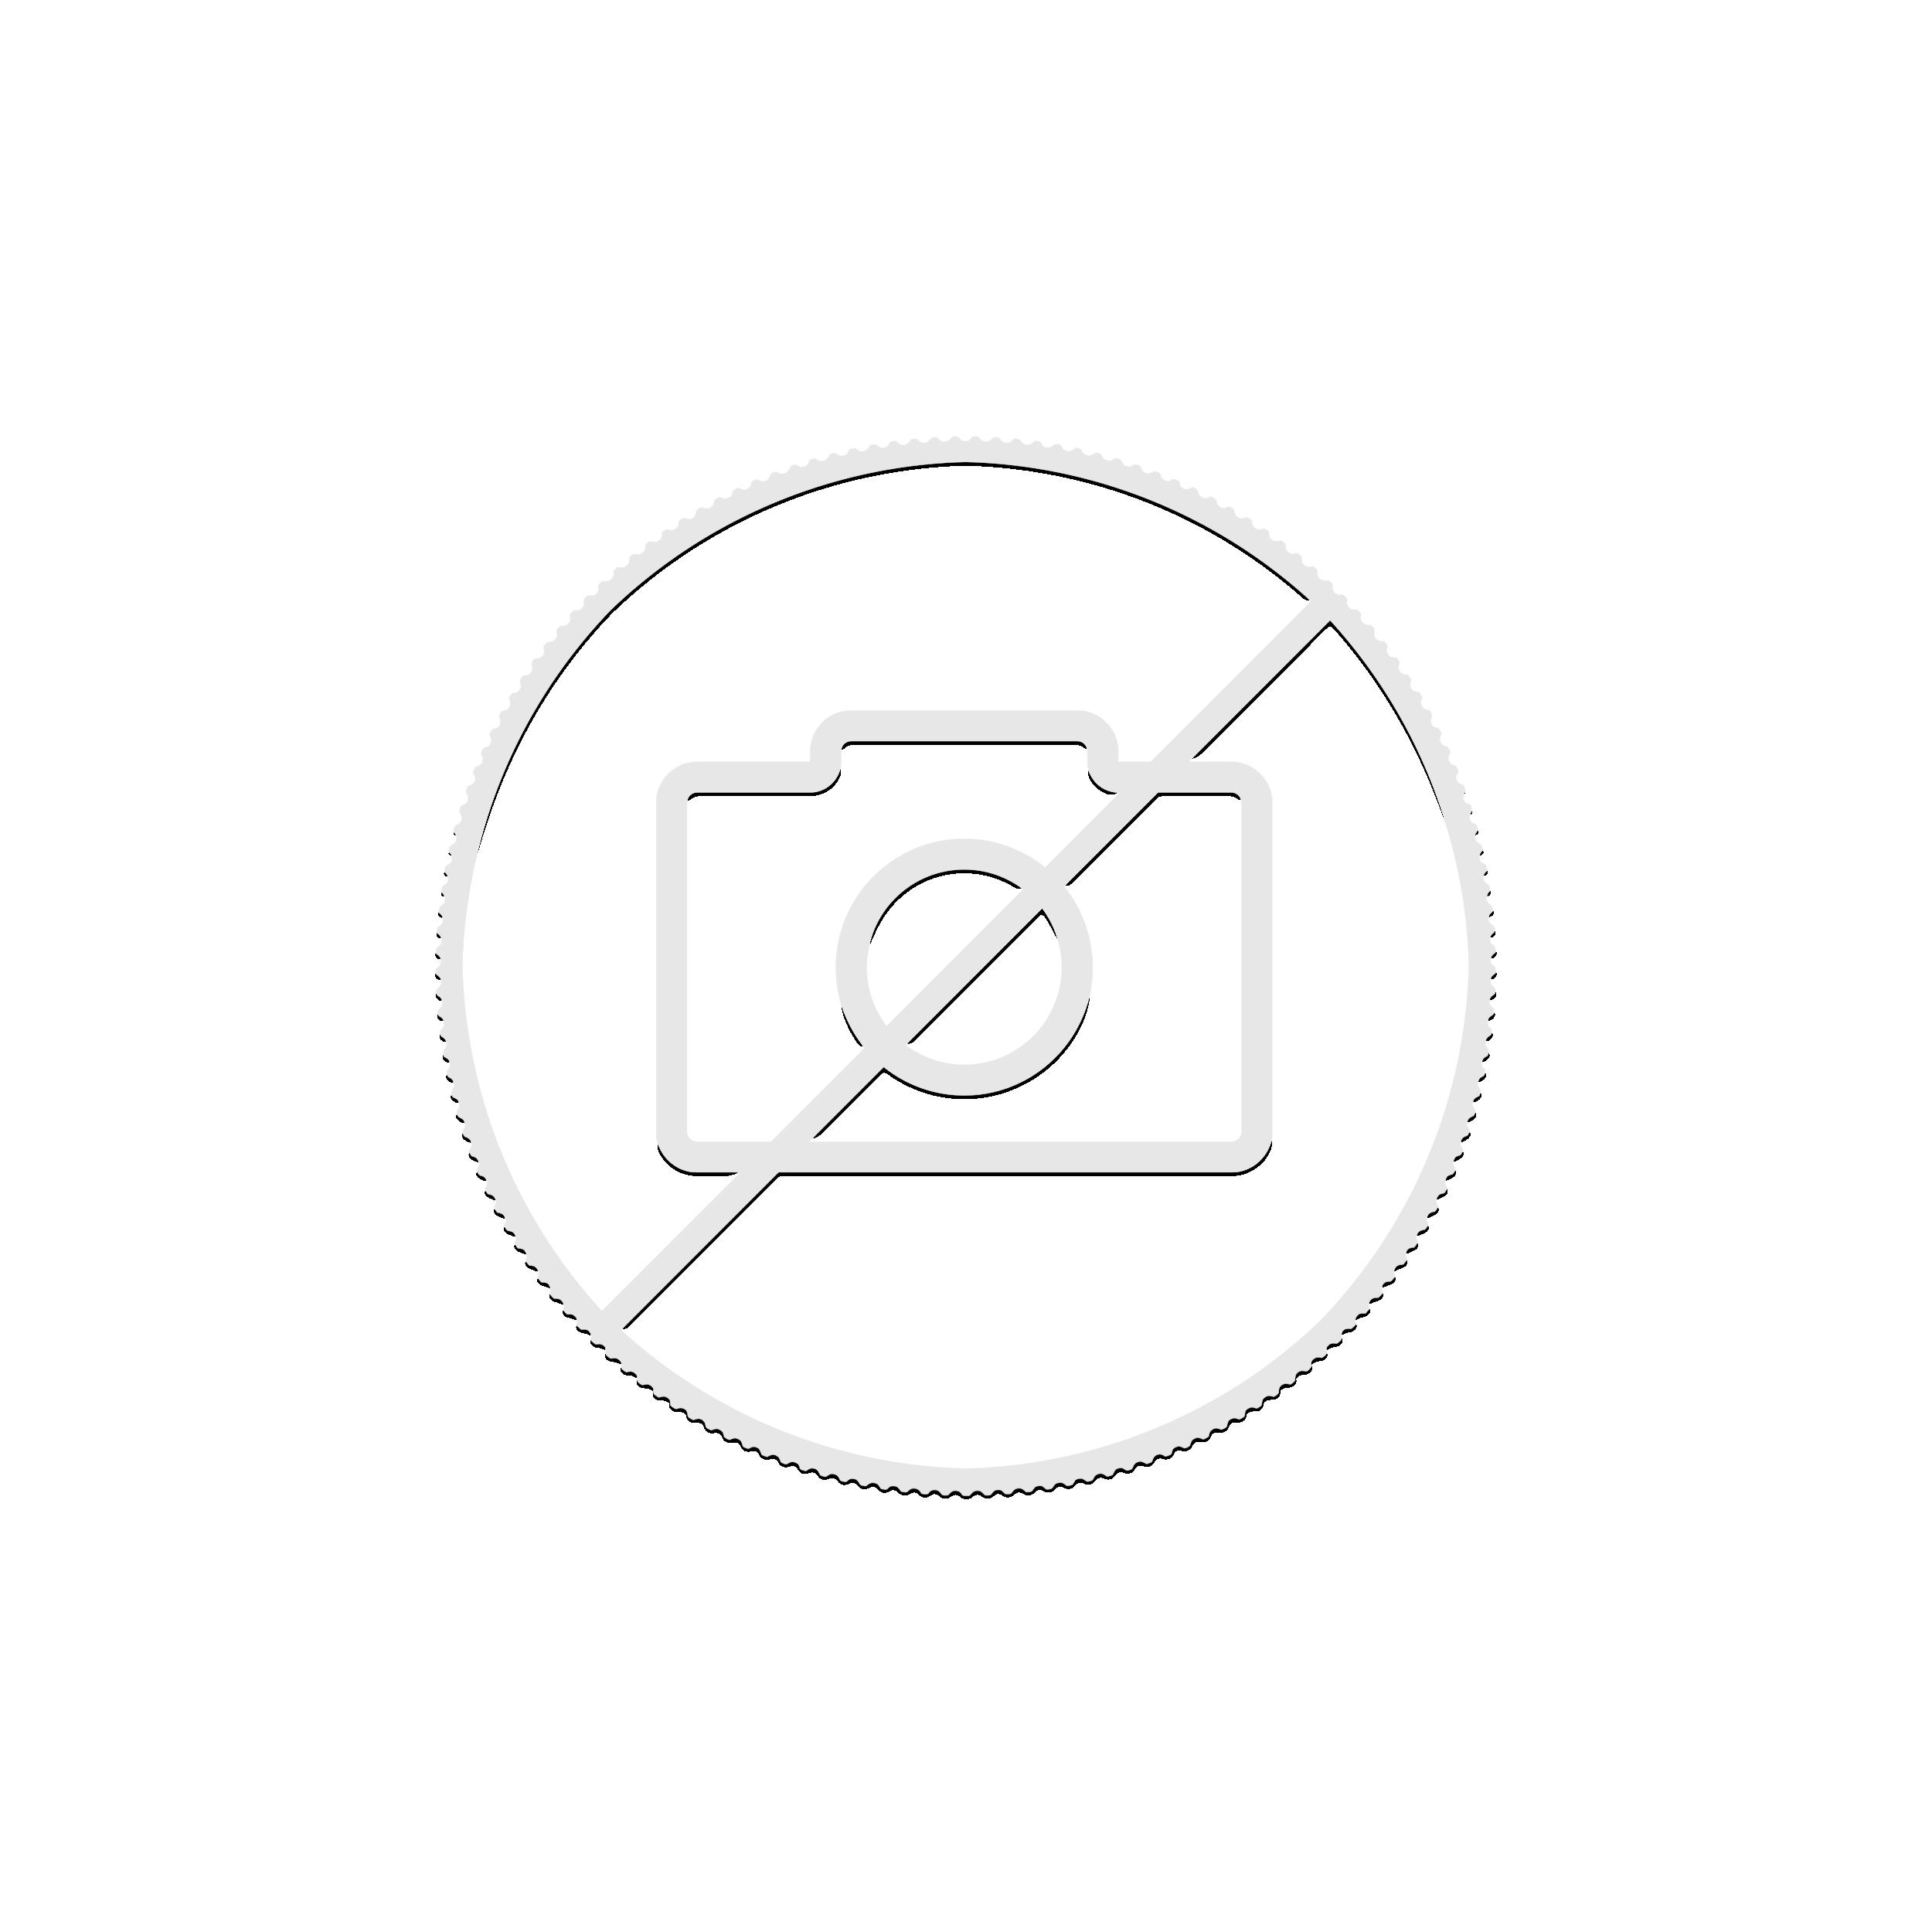 2 troy ounce silver coin Lü Bü battle against three heroes 2021 - antique finish